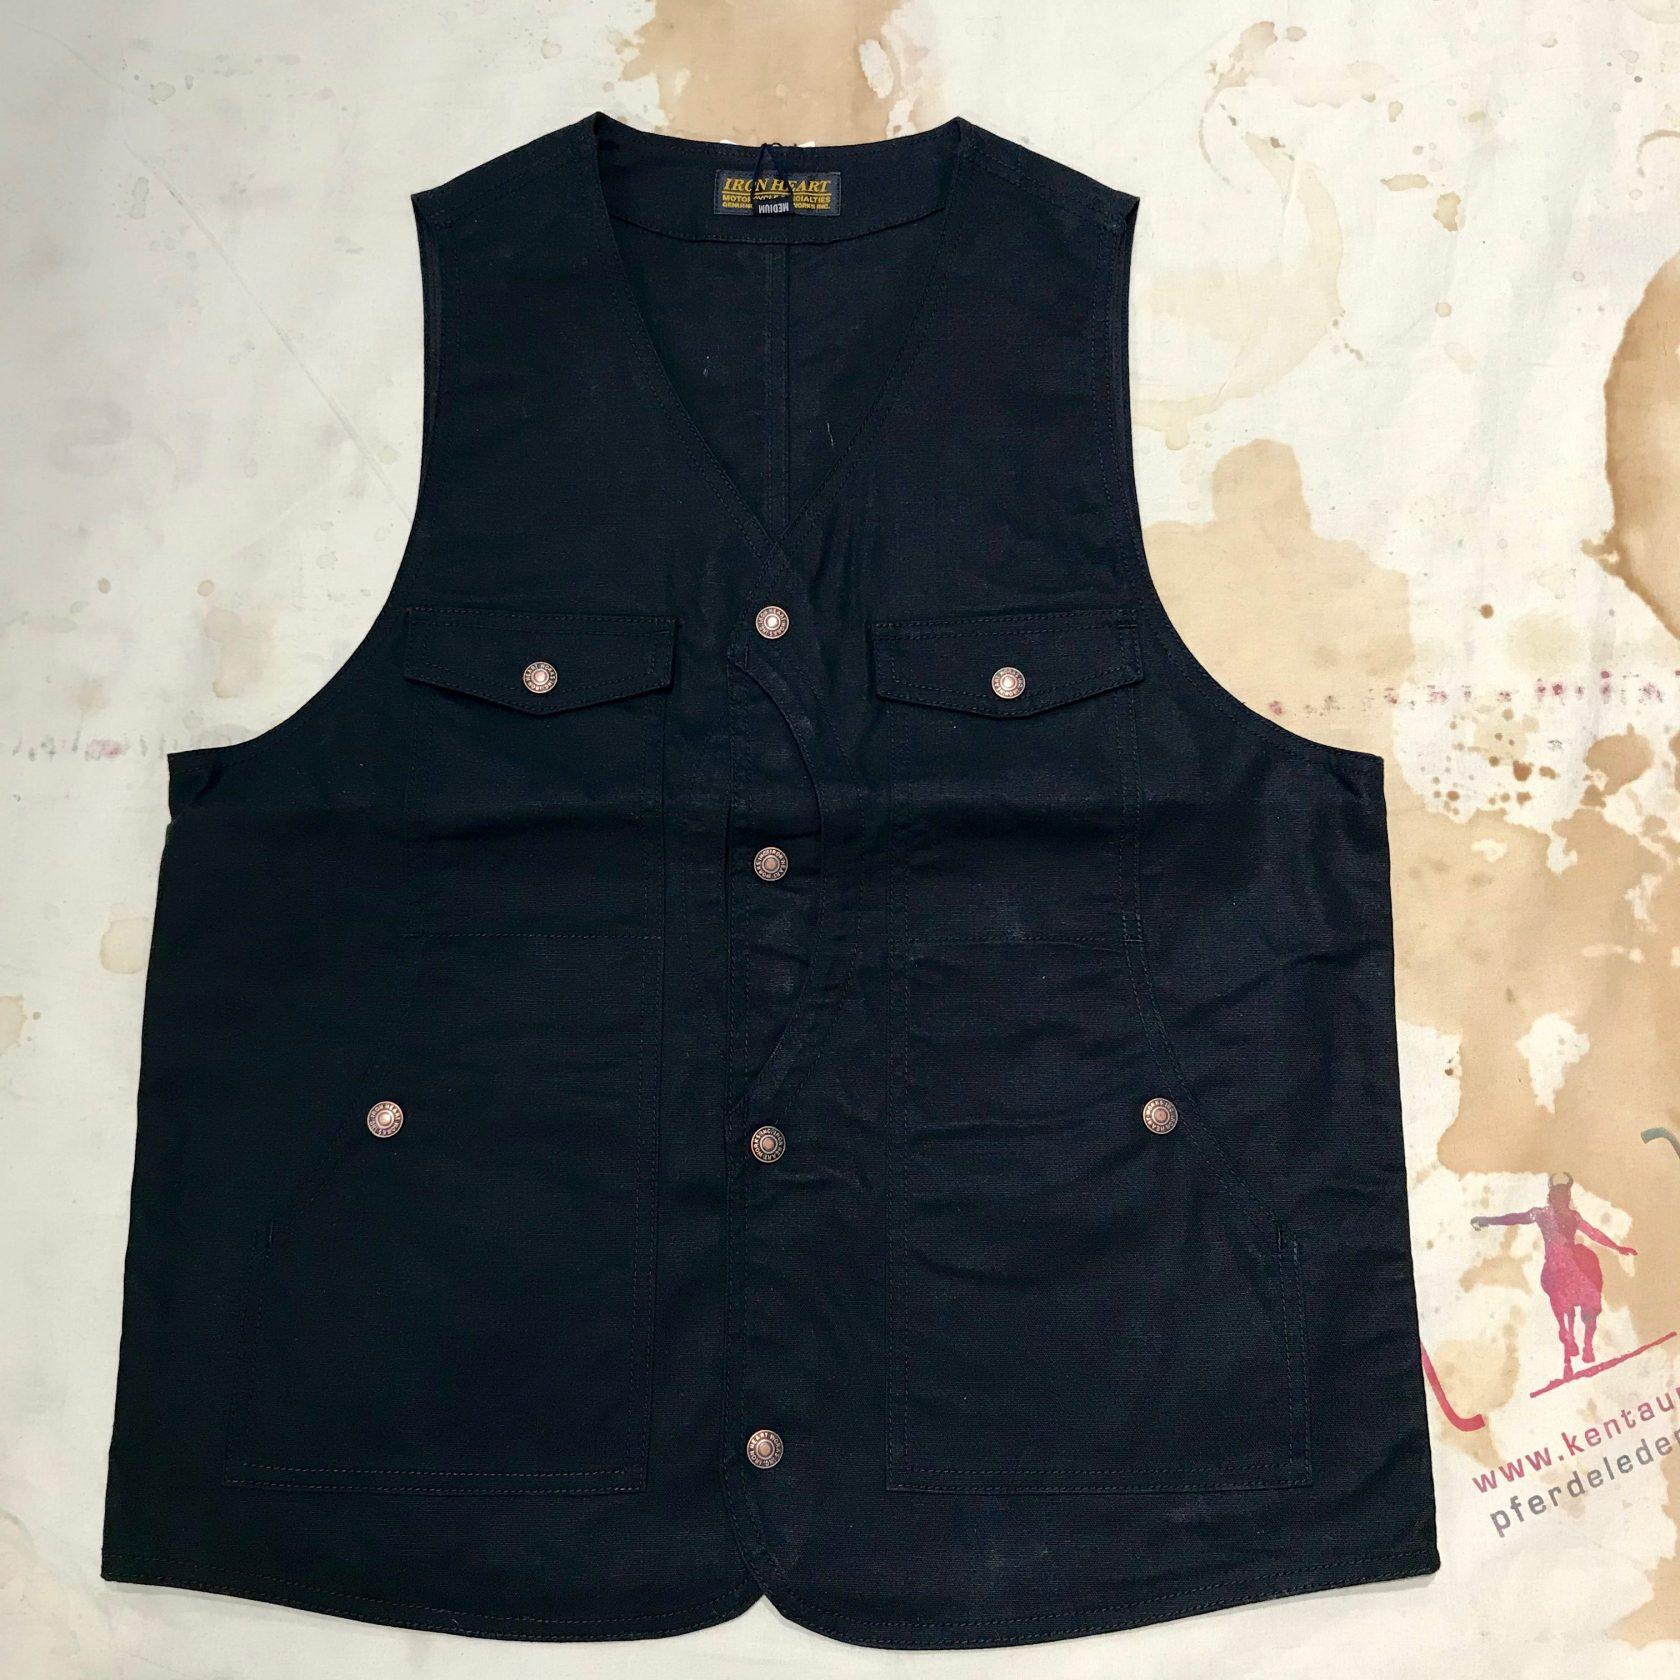 Iron Heart IHV-34 black hunting vest